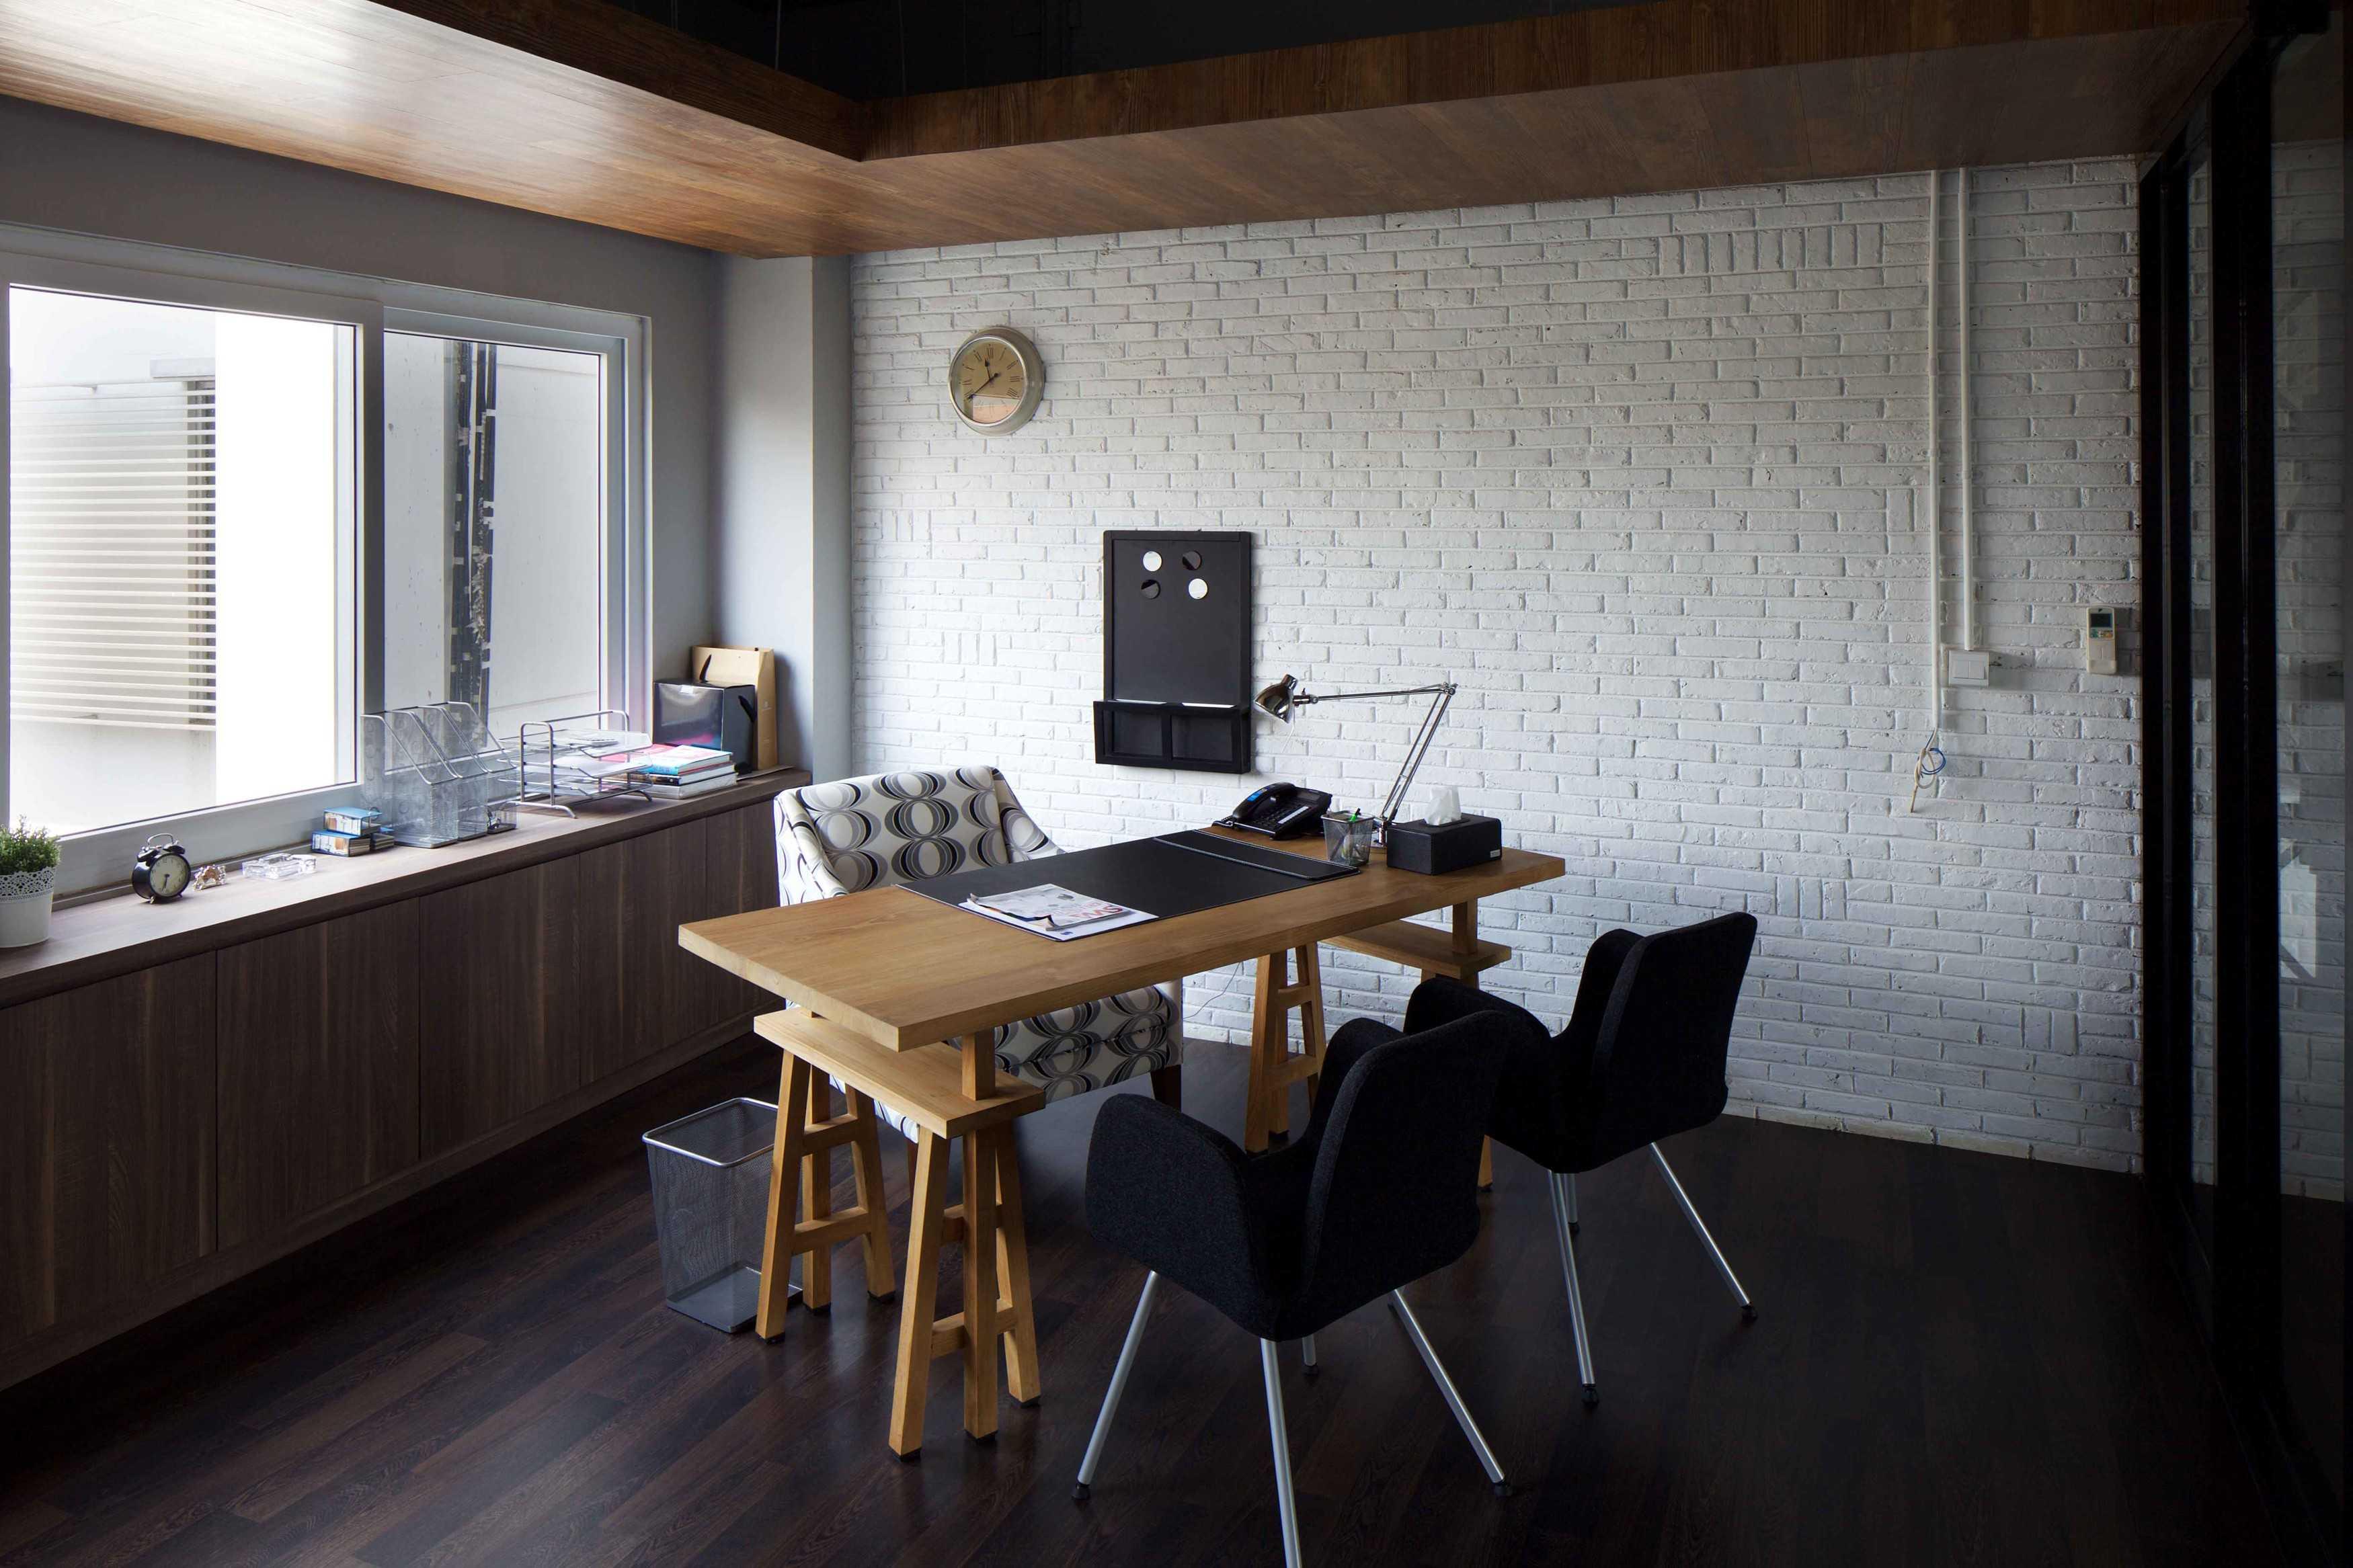 Vin•da•te Spektra Solusindo Bsd - Tangerang Bsd - Tangerang Office Room Industrial  17464